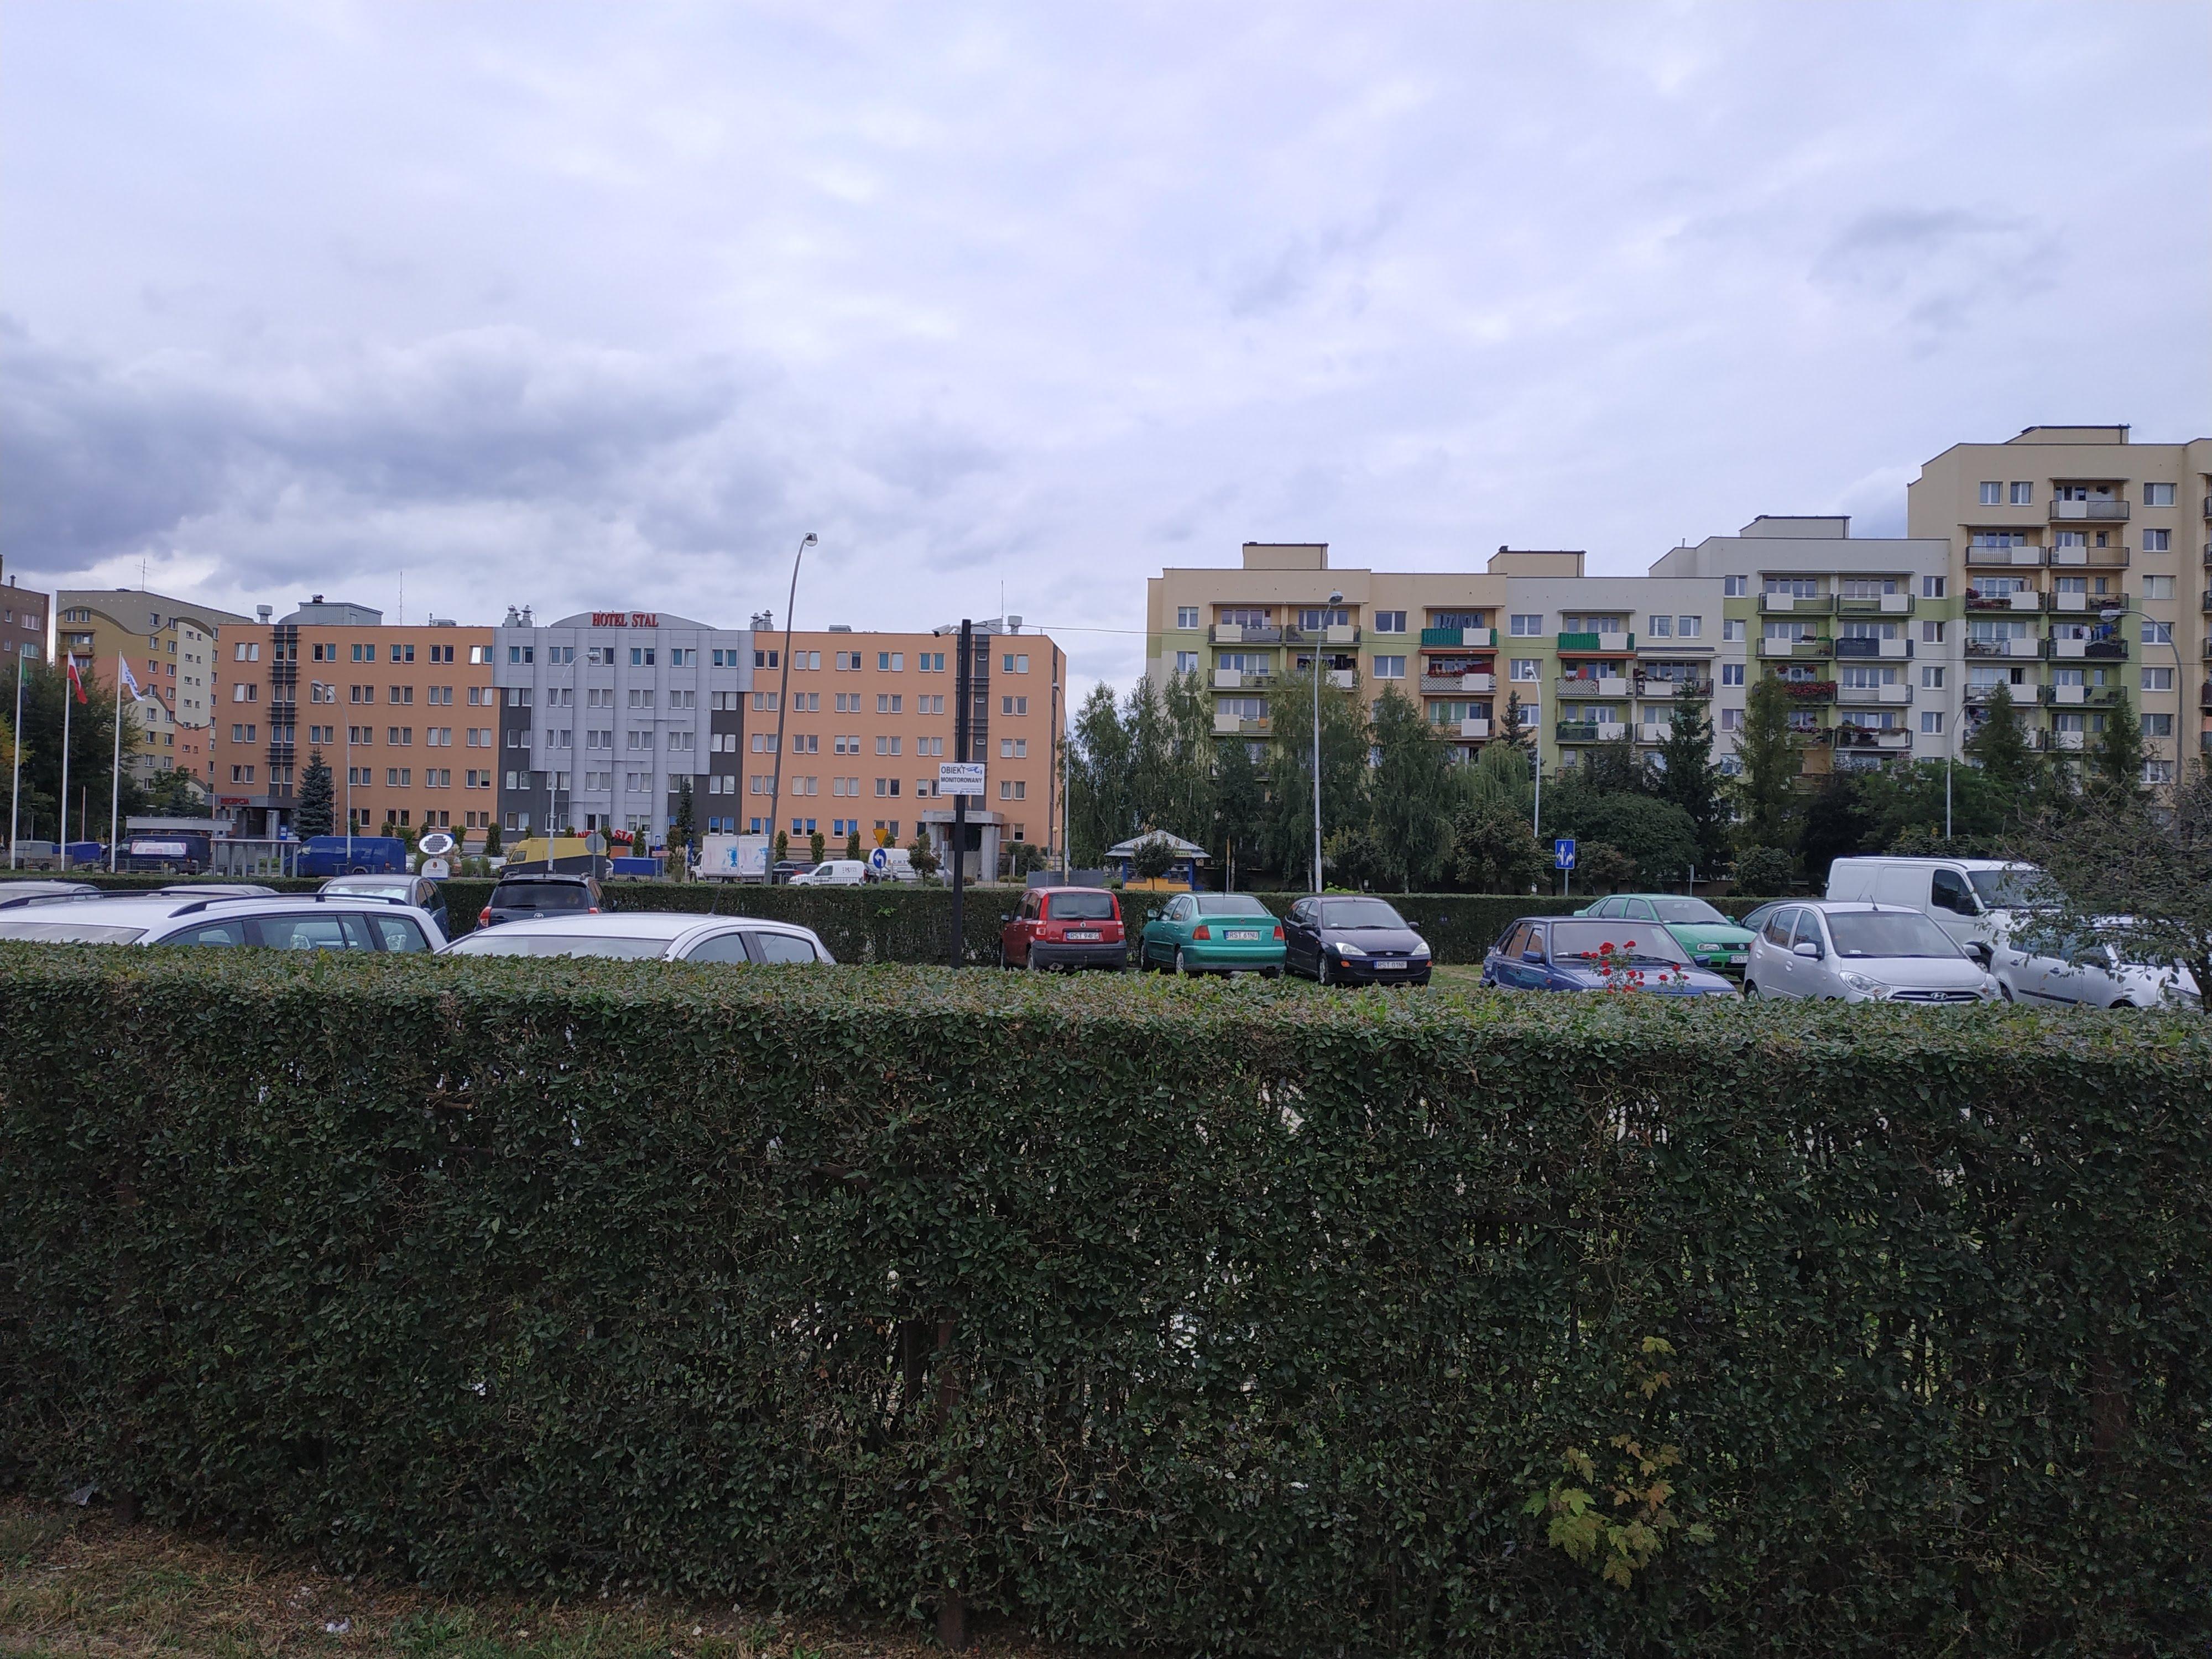 Monitoring Parkingu - Stalowa Wola. Hikvision monitoring sandomierz monitoring tarnobrzeg